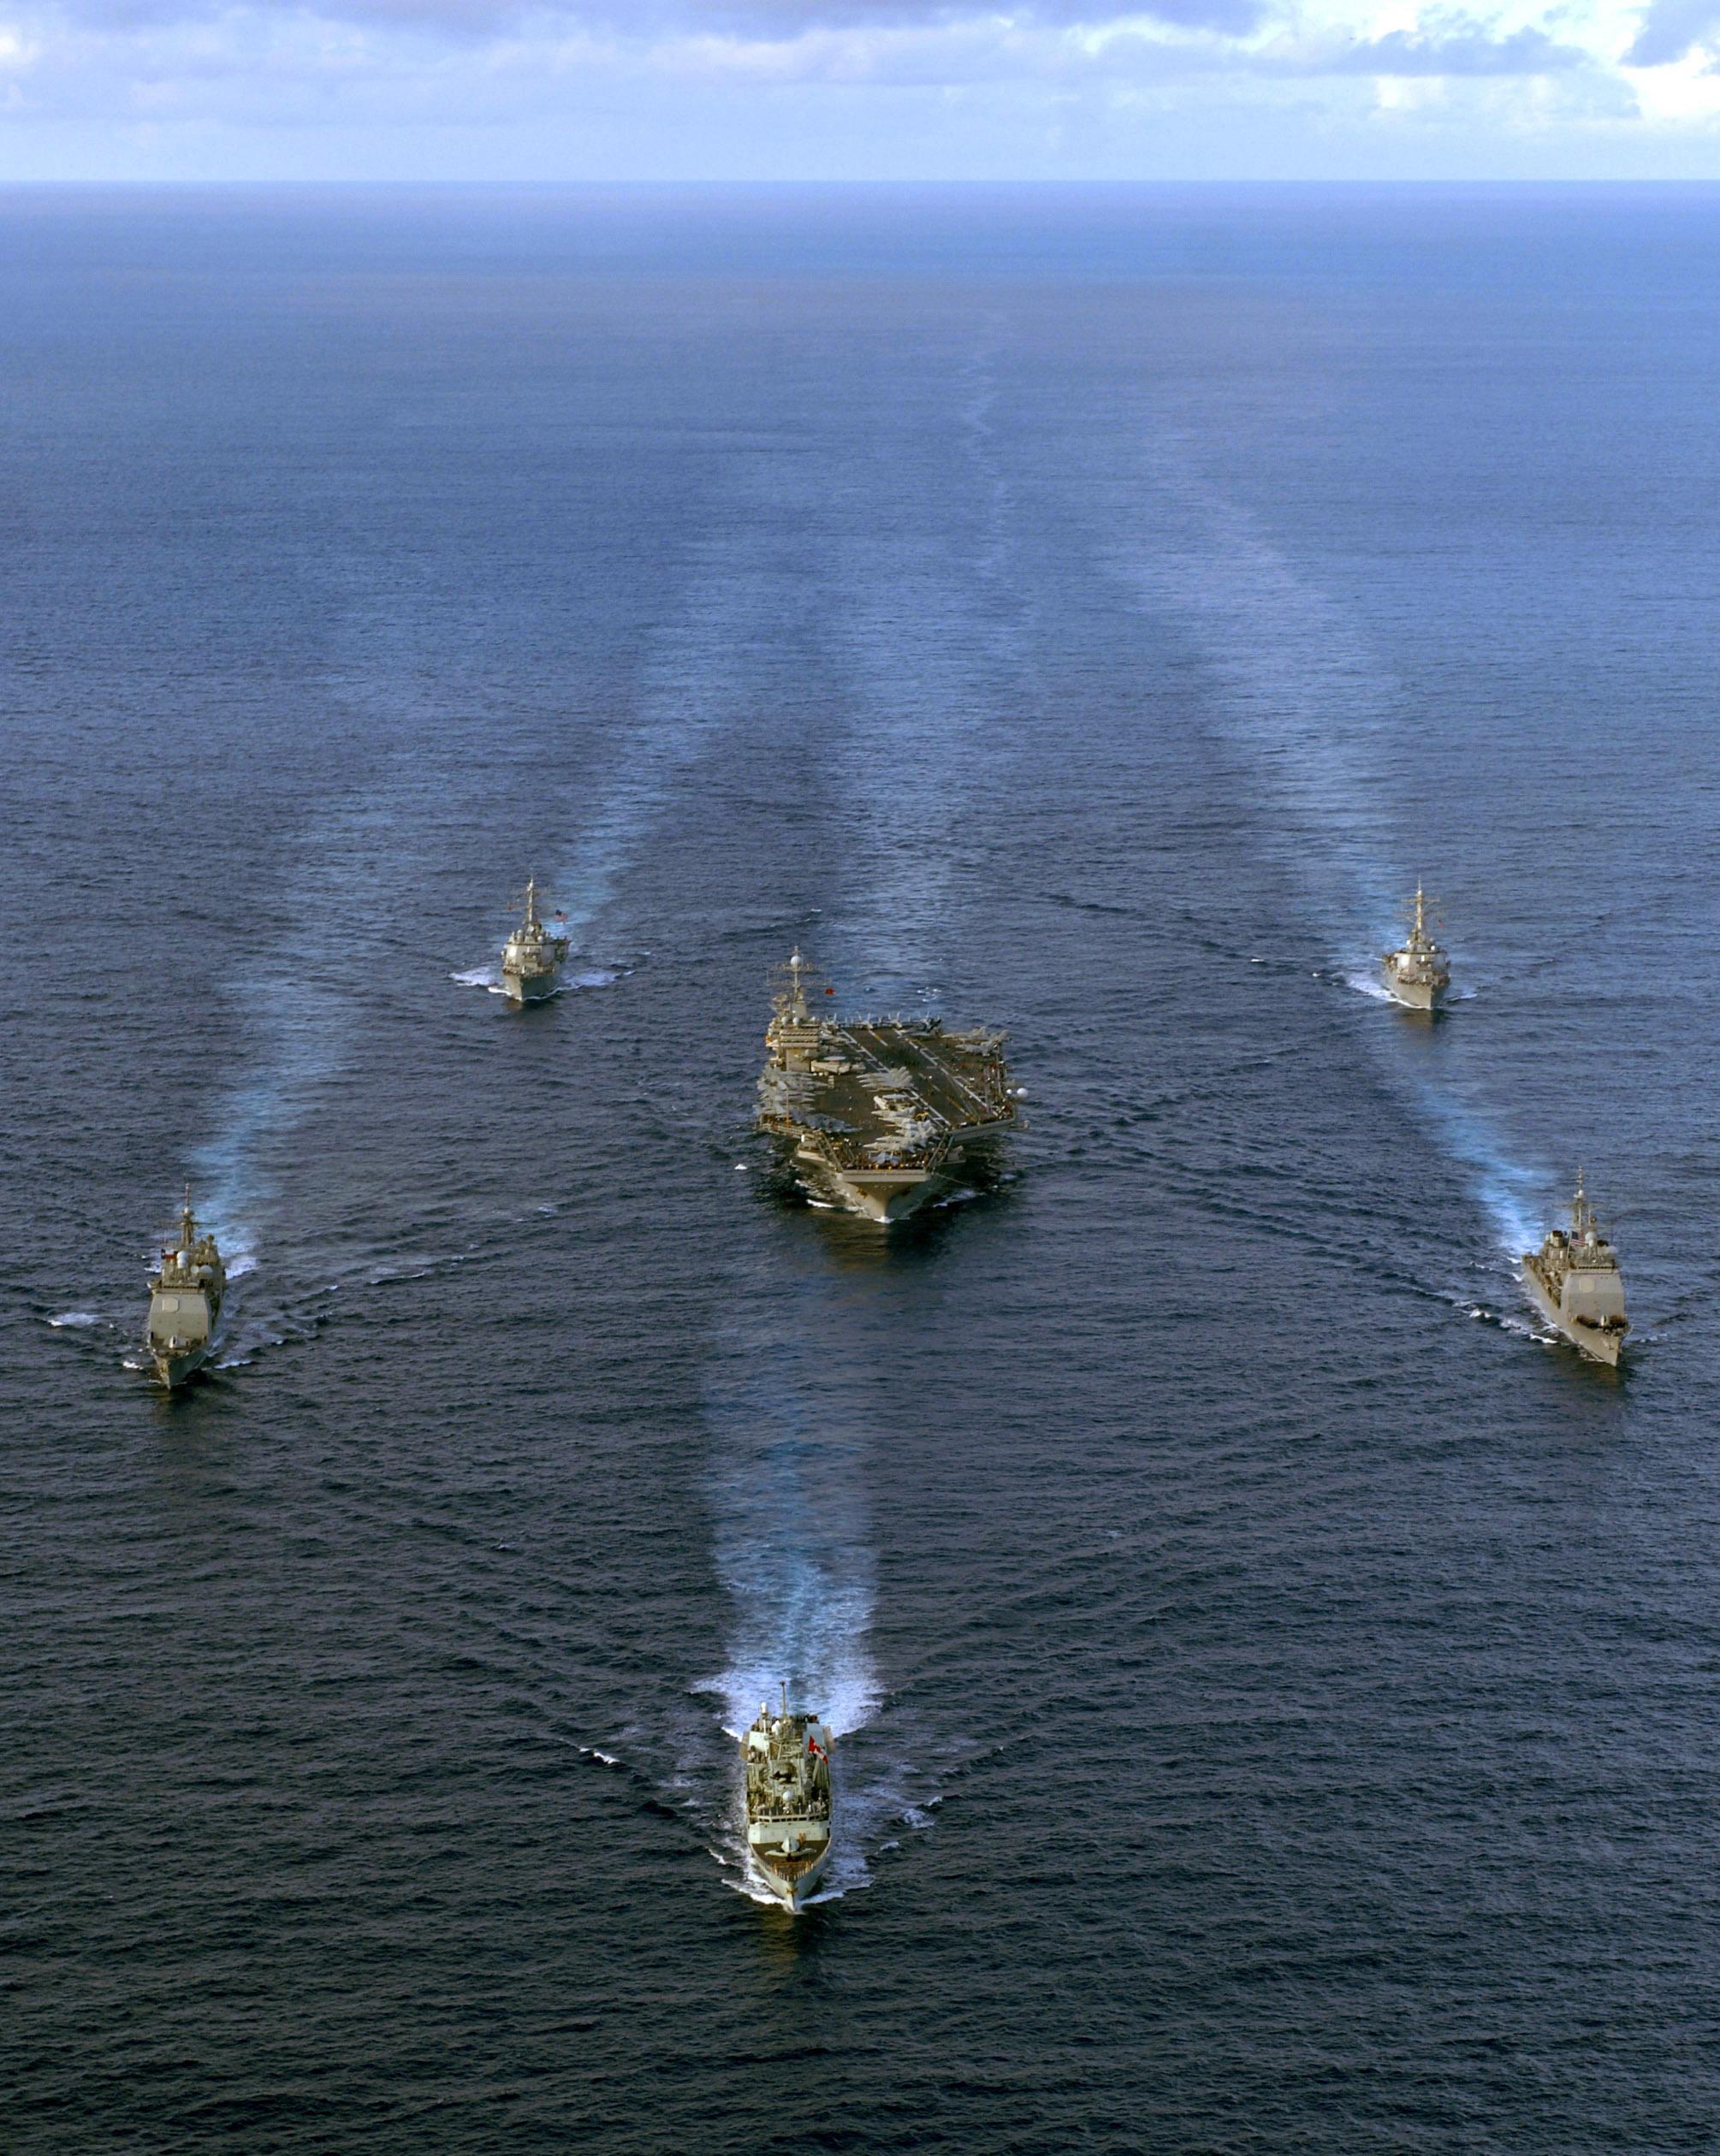 Carrier Strike Group Ten 81